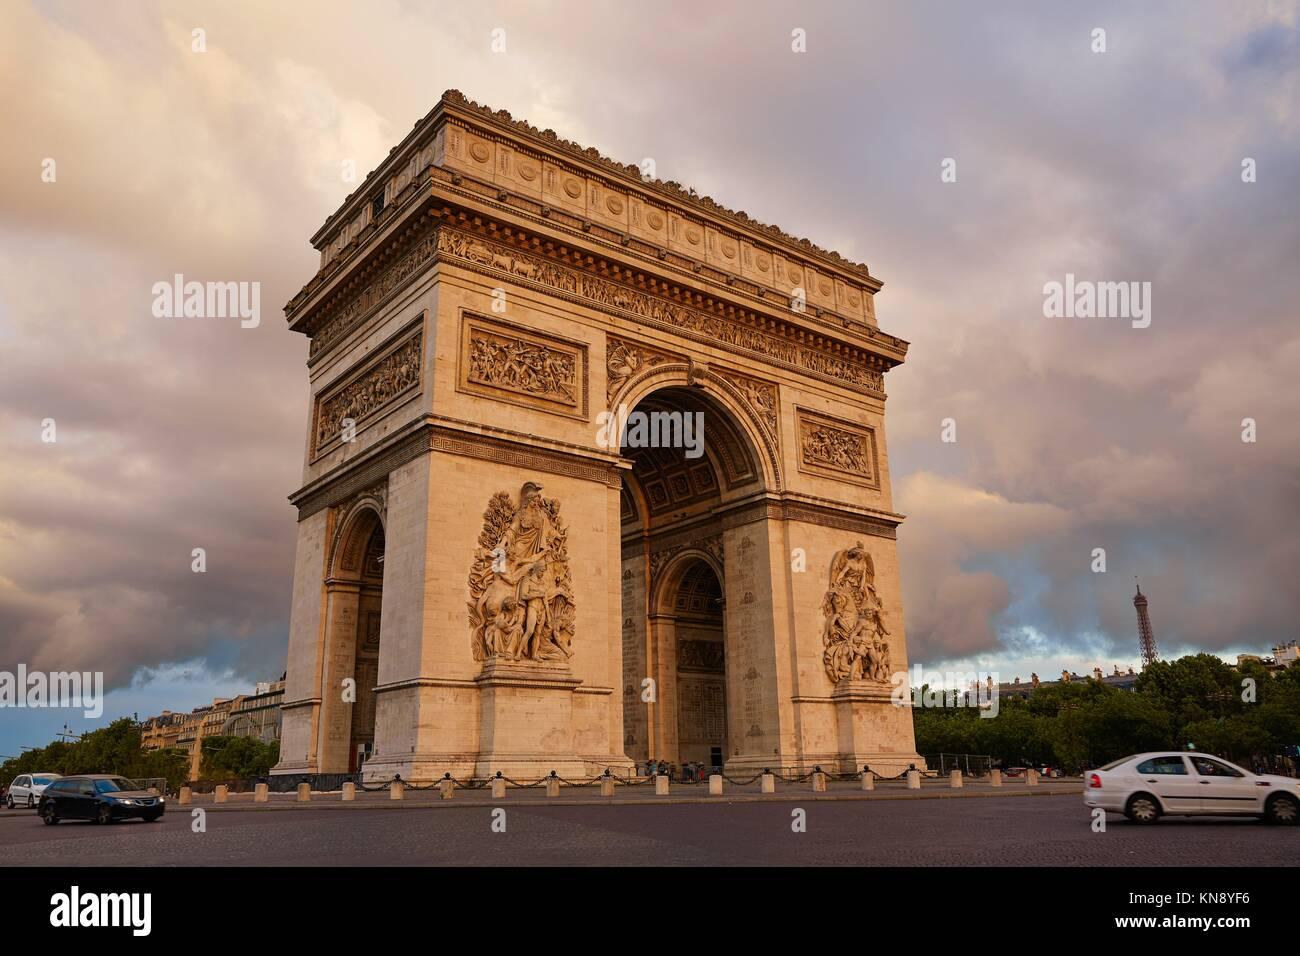 Arc de Triomphe in Paris Arch of Triumph sunset at France. - Stock Image